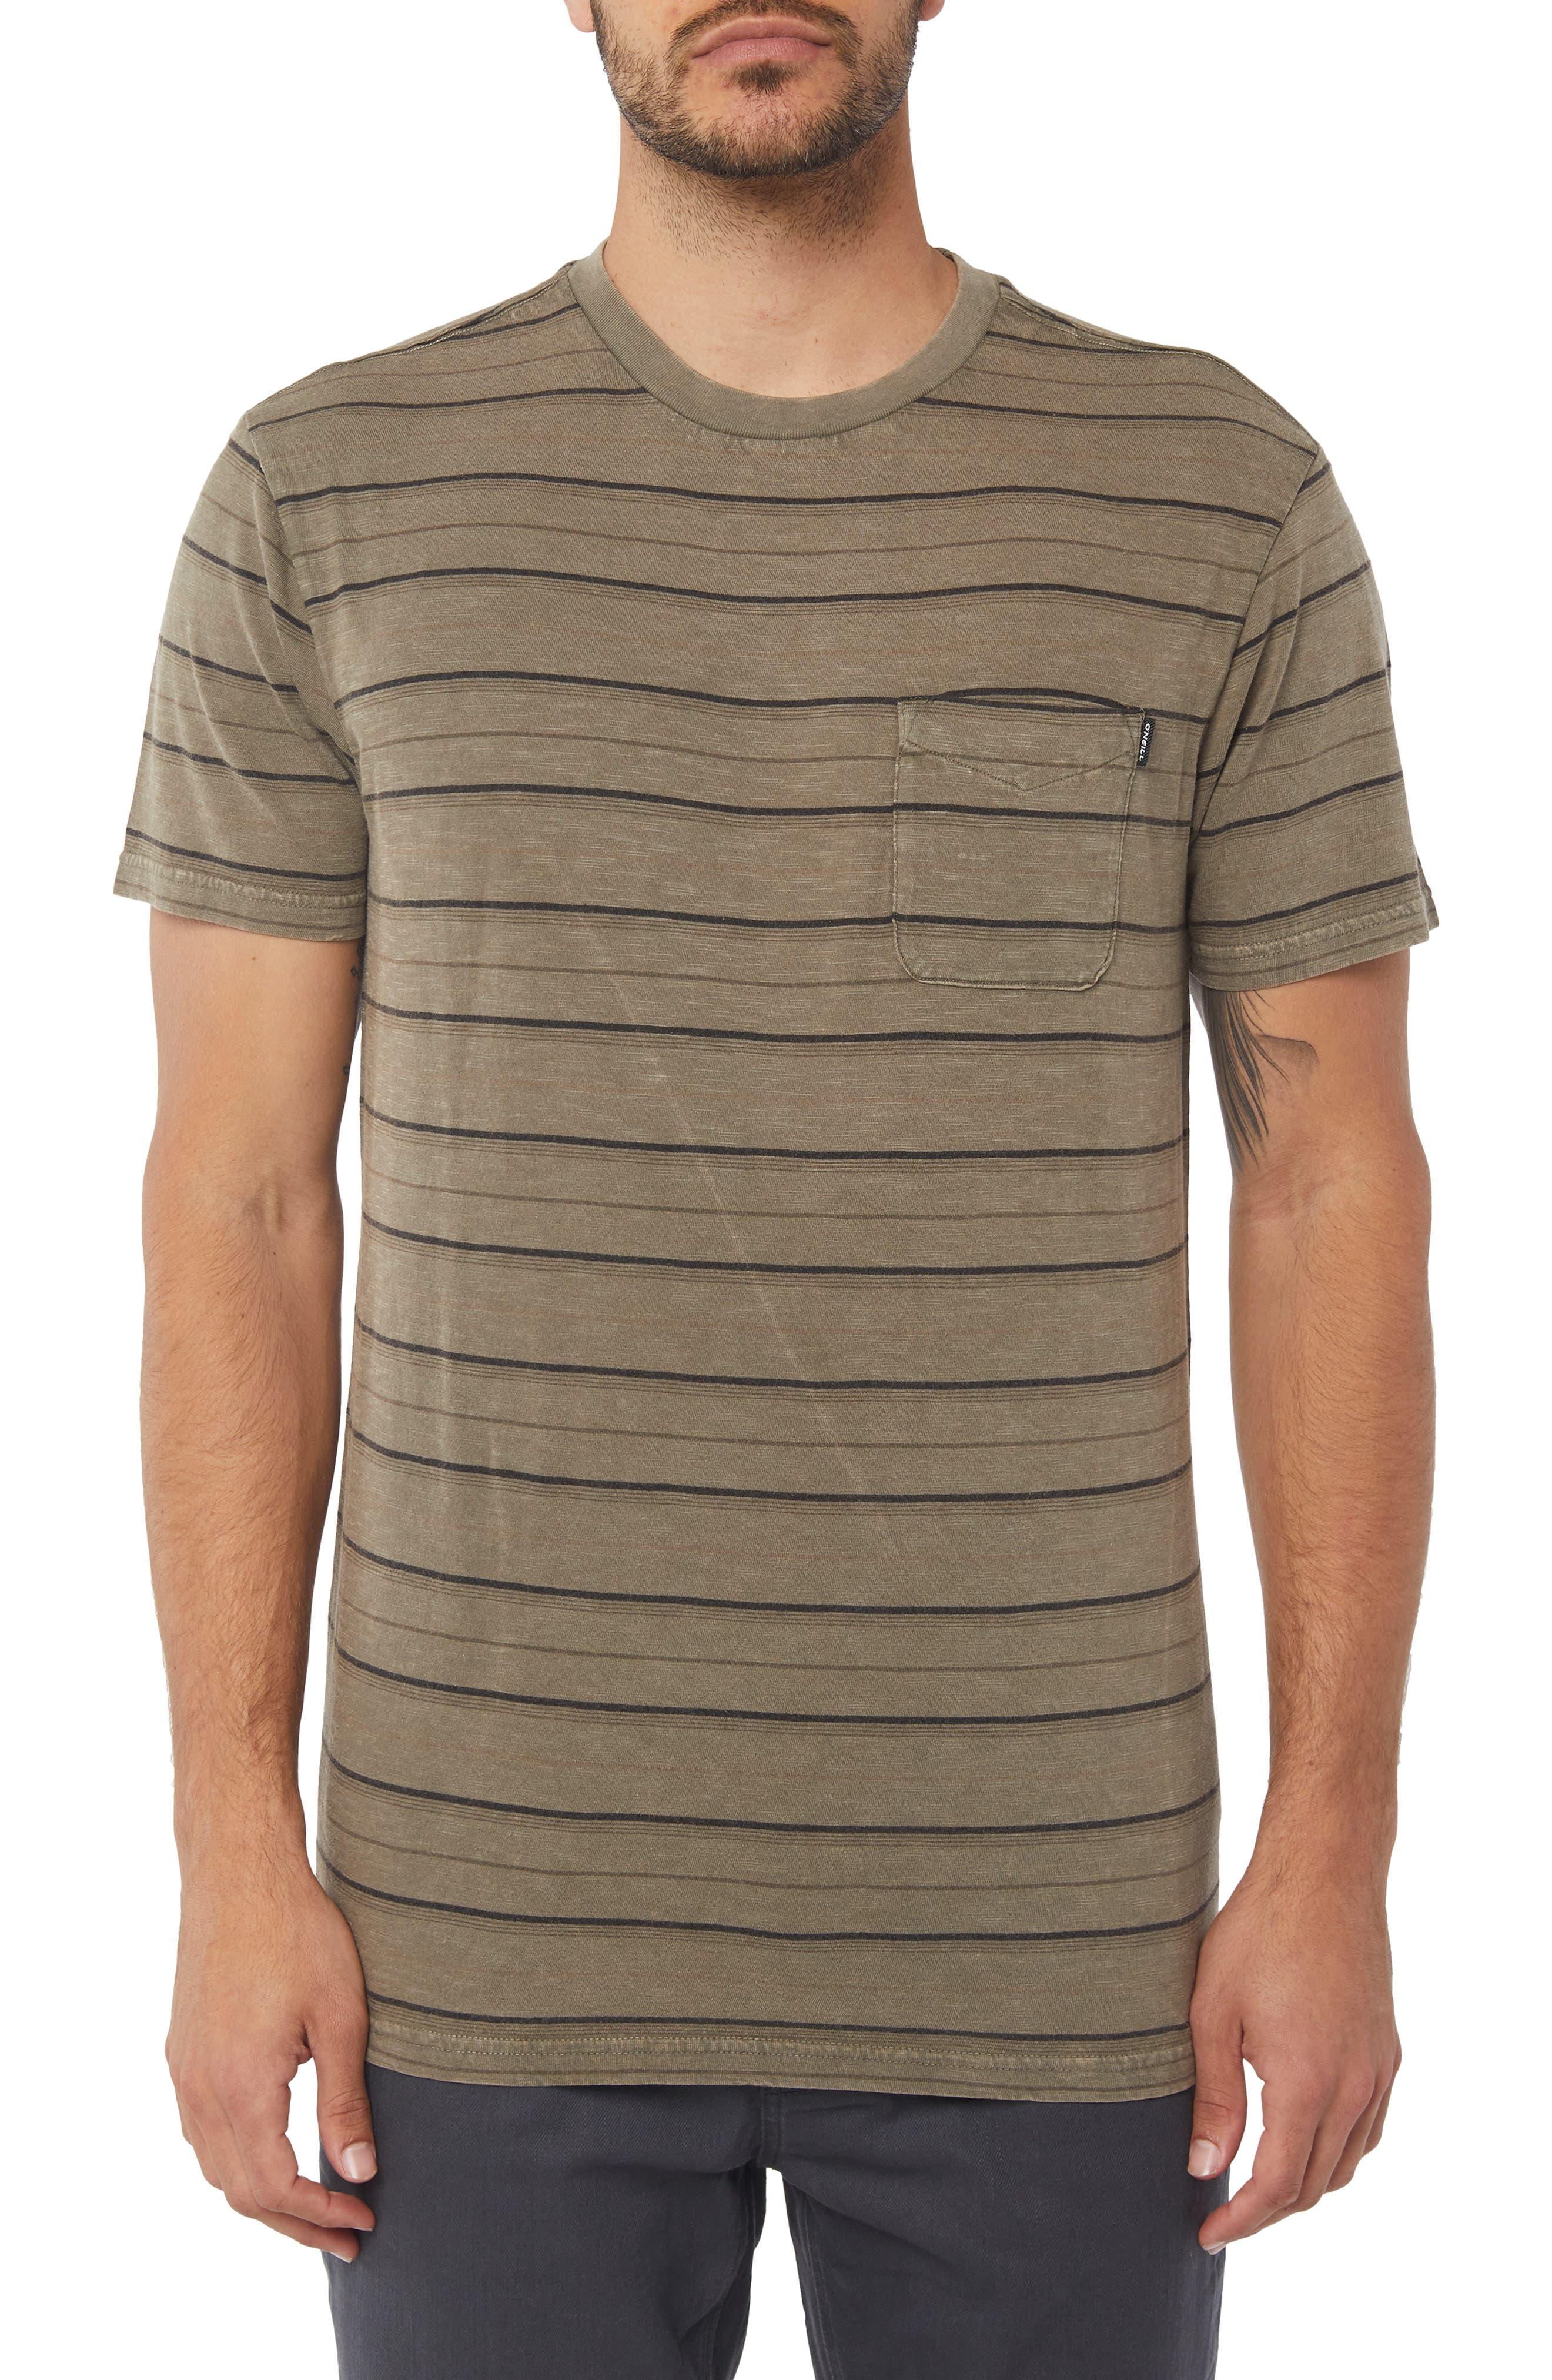 O'Neil Detroit Dinsmore Crew T-shirt,                             Main thumbnail 1, color,                             MILITARY